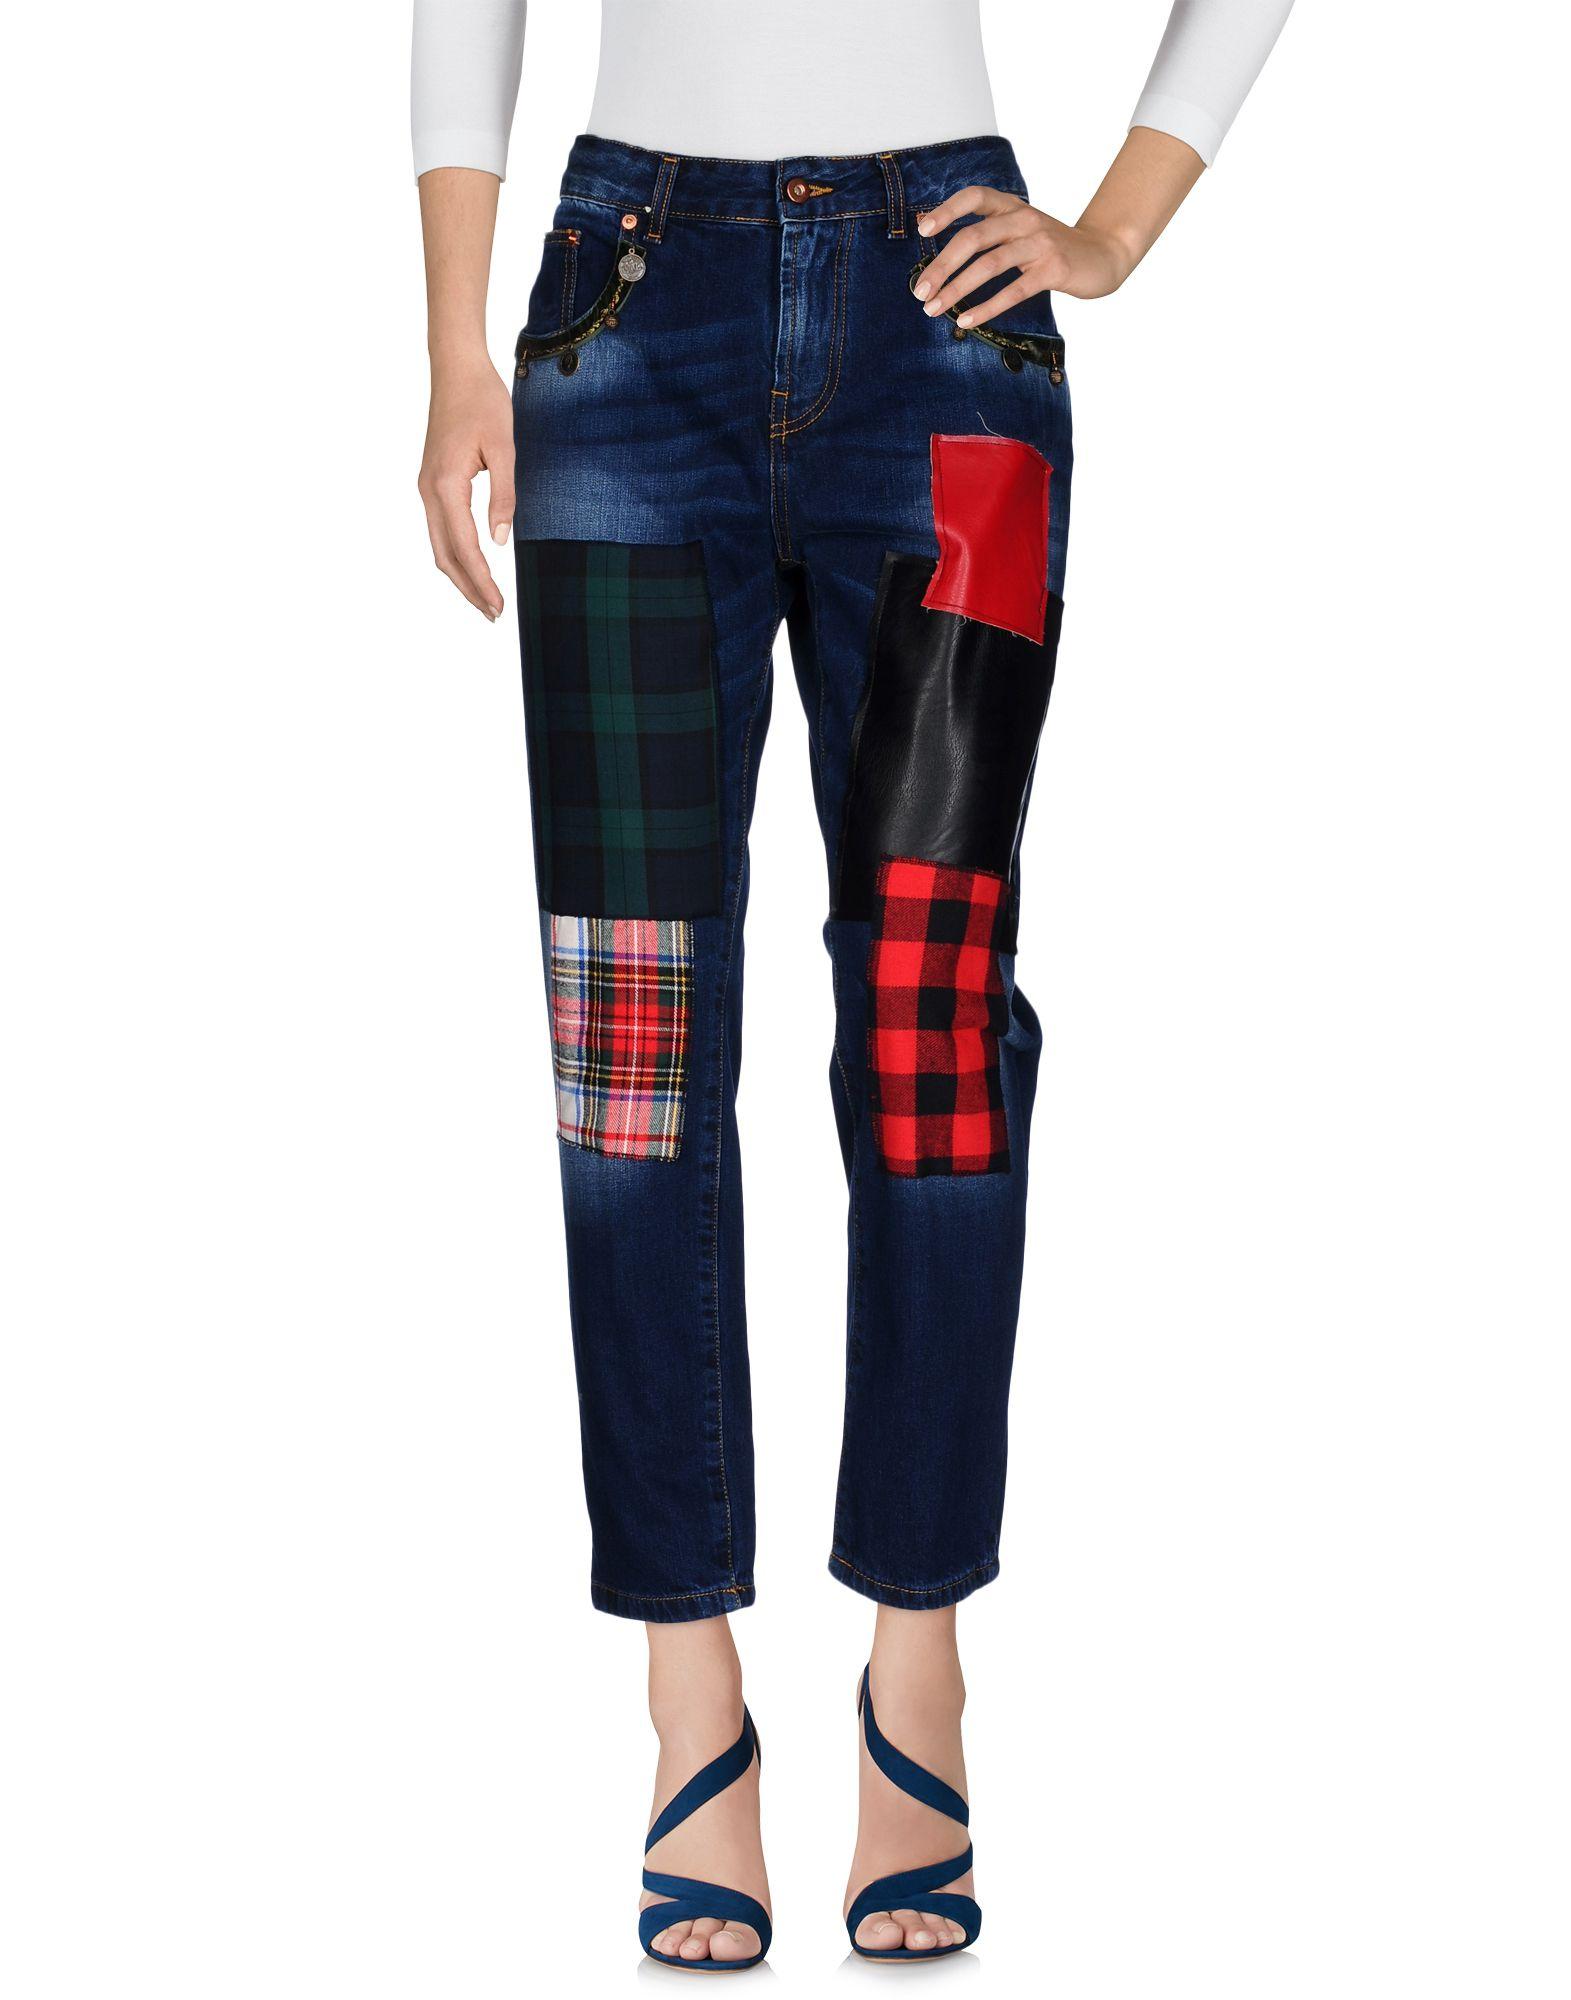 ITALOGY Damen Jeanshose Farbe Blau Größe 3 jetztbilligerkaufen